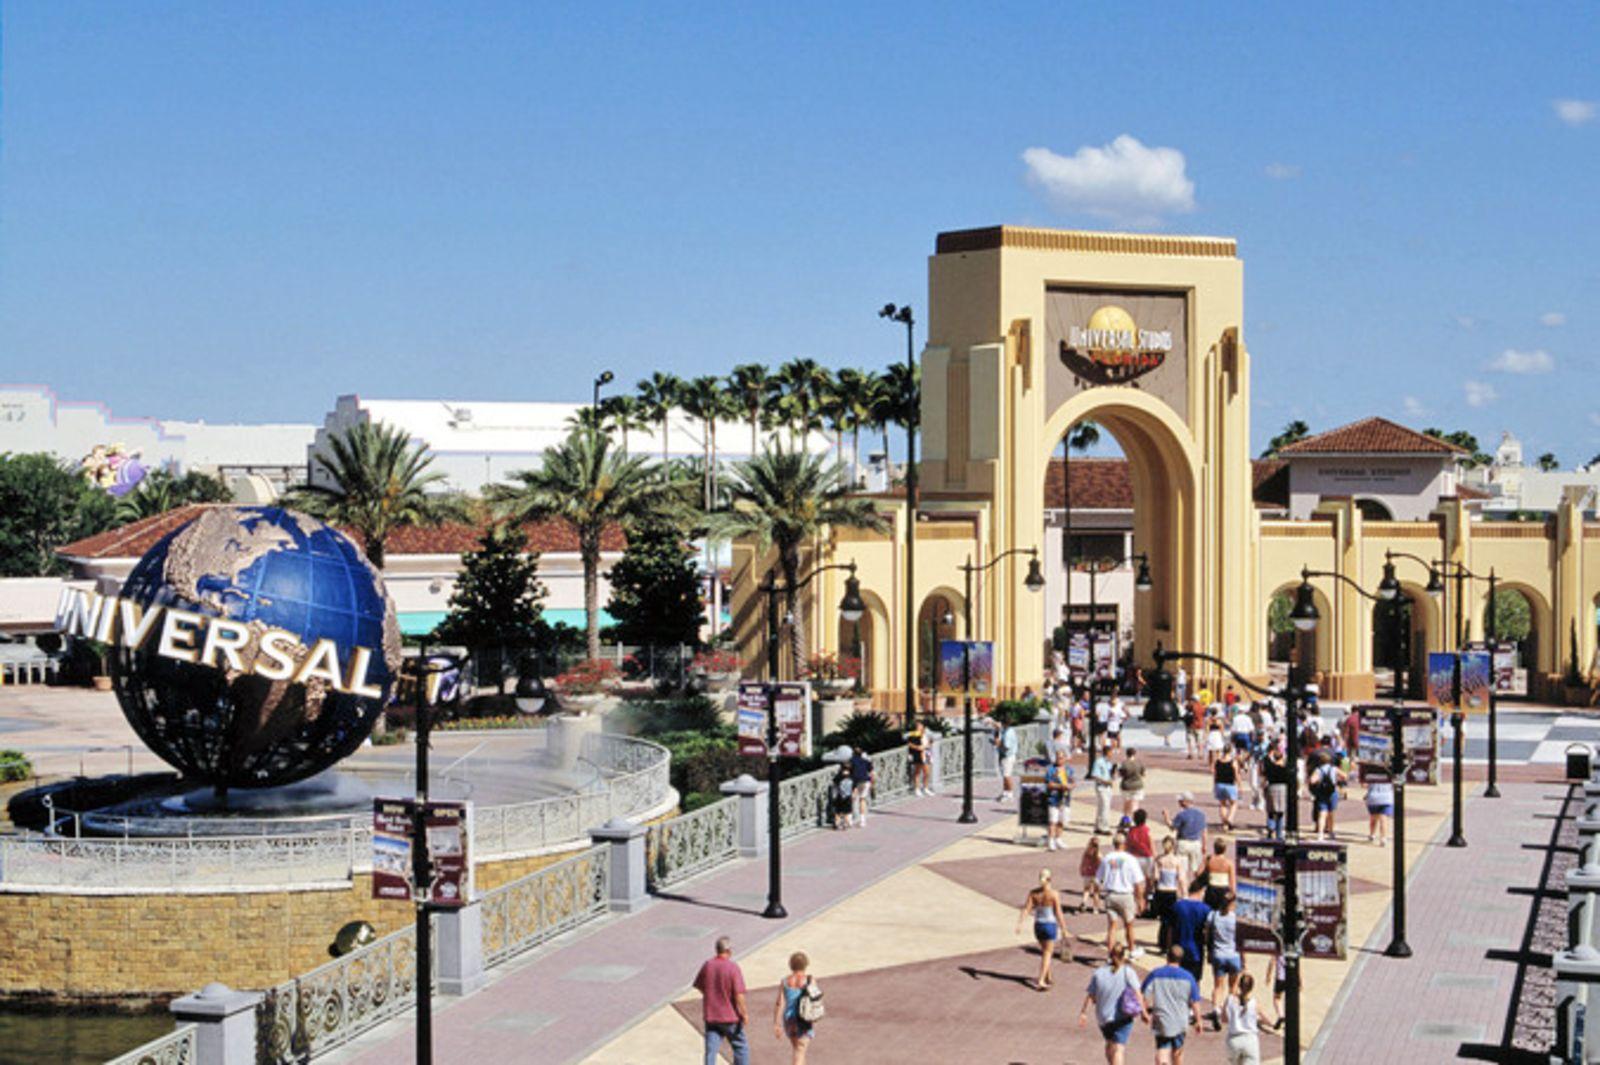 Universal Studios in Orlando